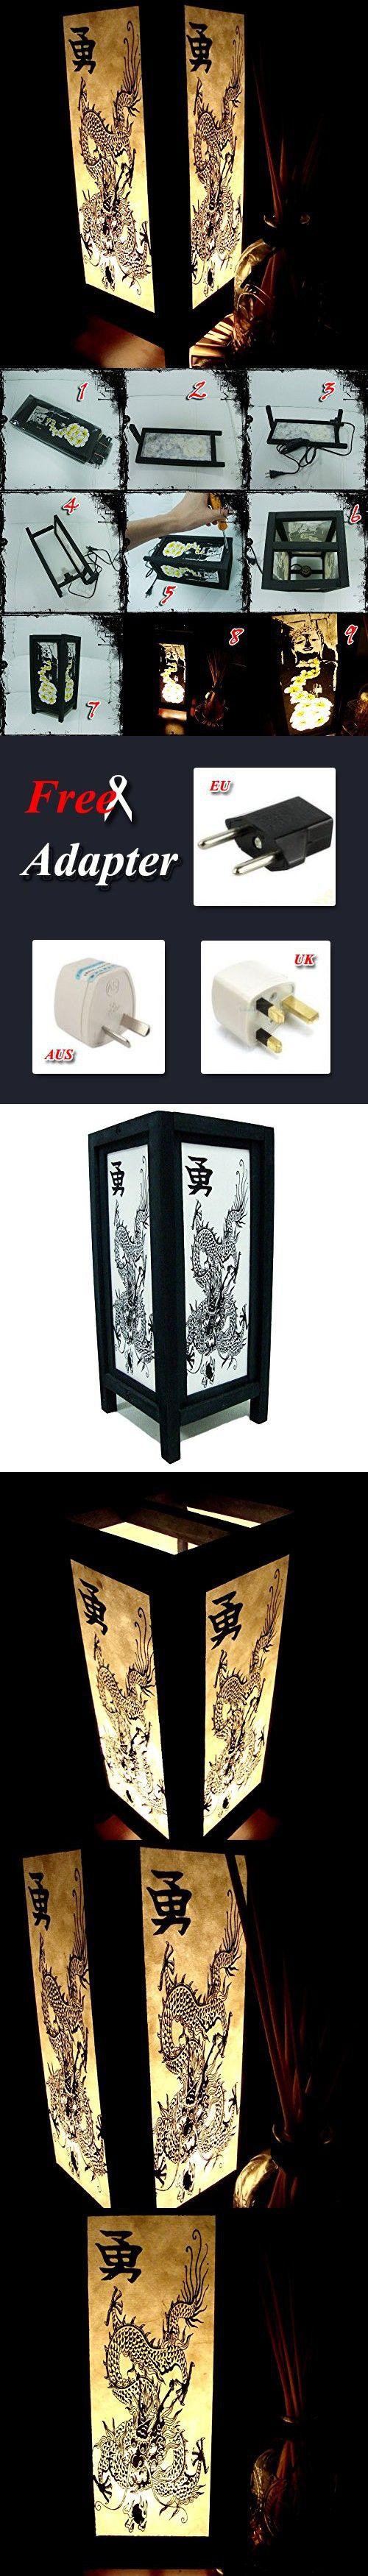 Chinese Dragon White Black Table Lamp Lighting Shades Floor Desk Outdoor Touch Room Bedroom Modern Vintage Handmade Asian Oriental Wood Bedside Gift Art Home Garden Christmas; Us 2 Pin Plug #404